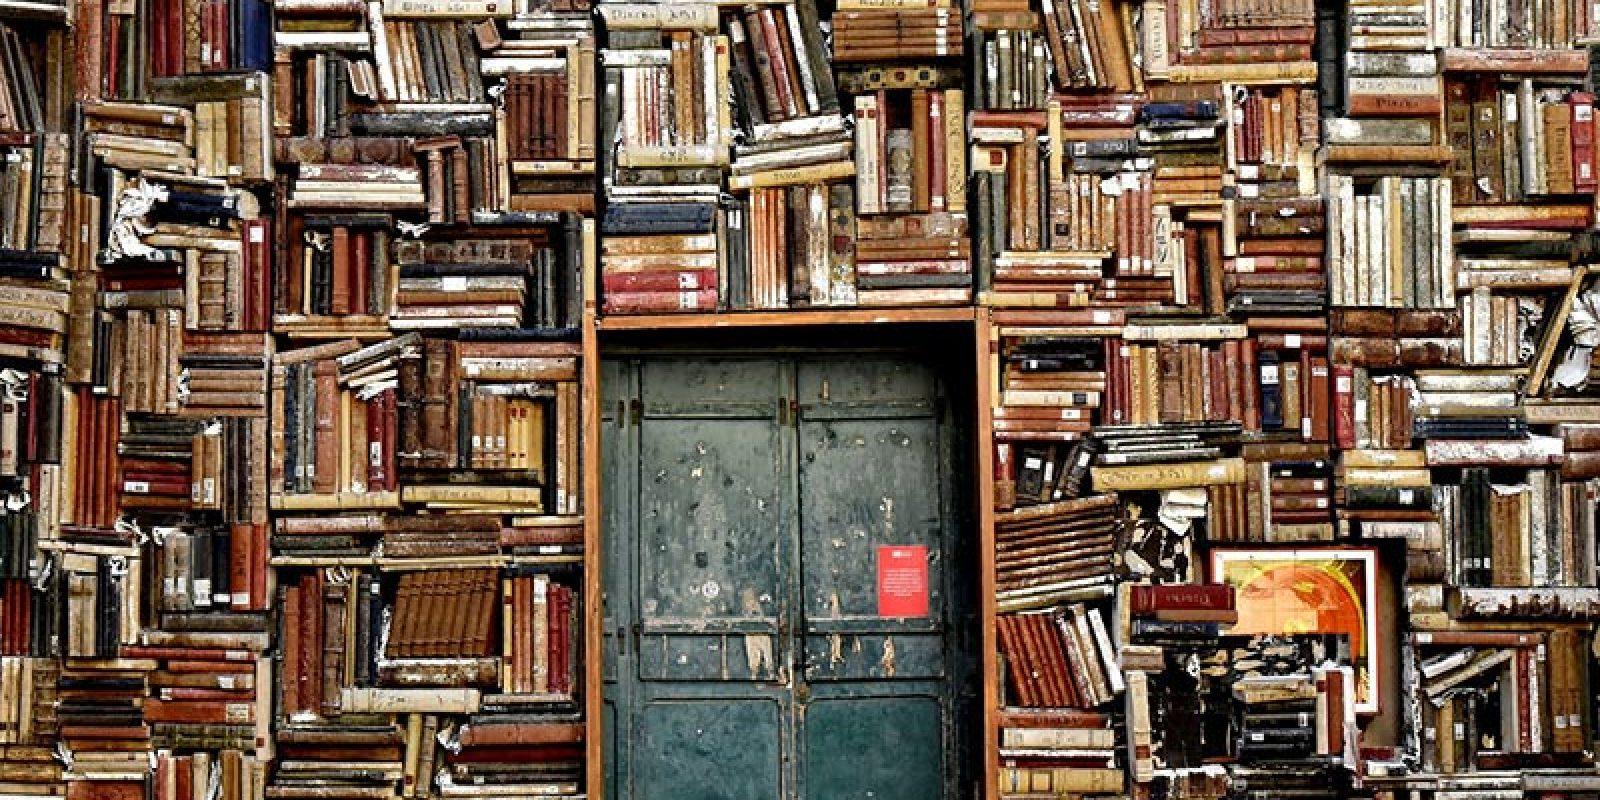 books-1655783_1920_web